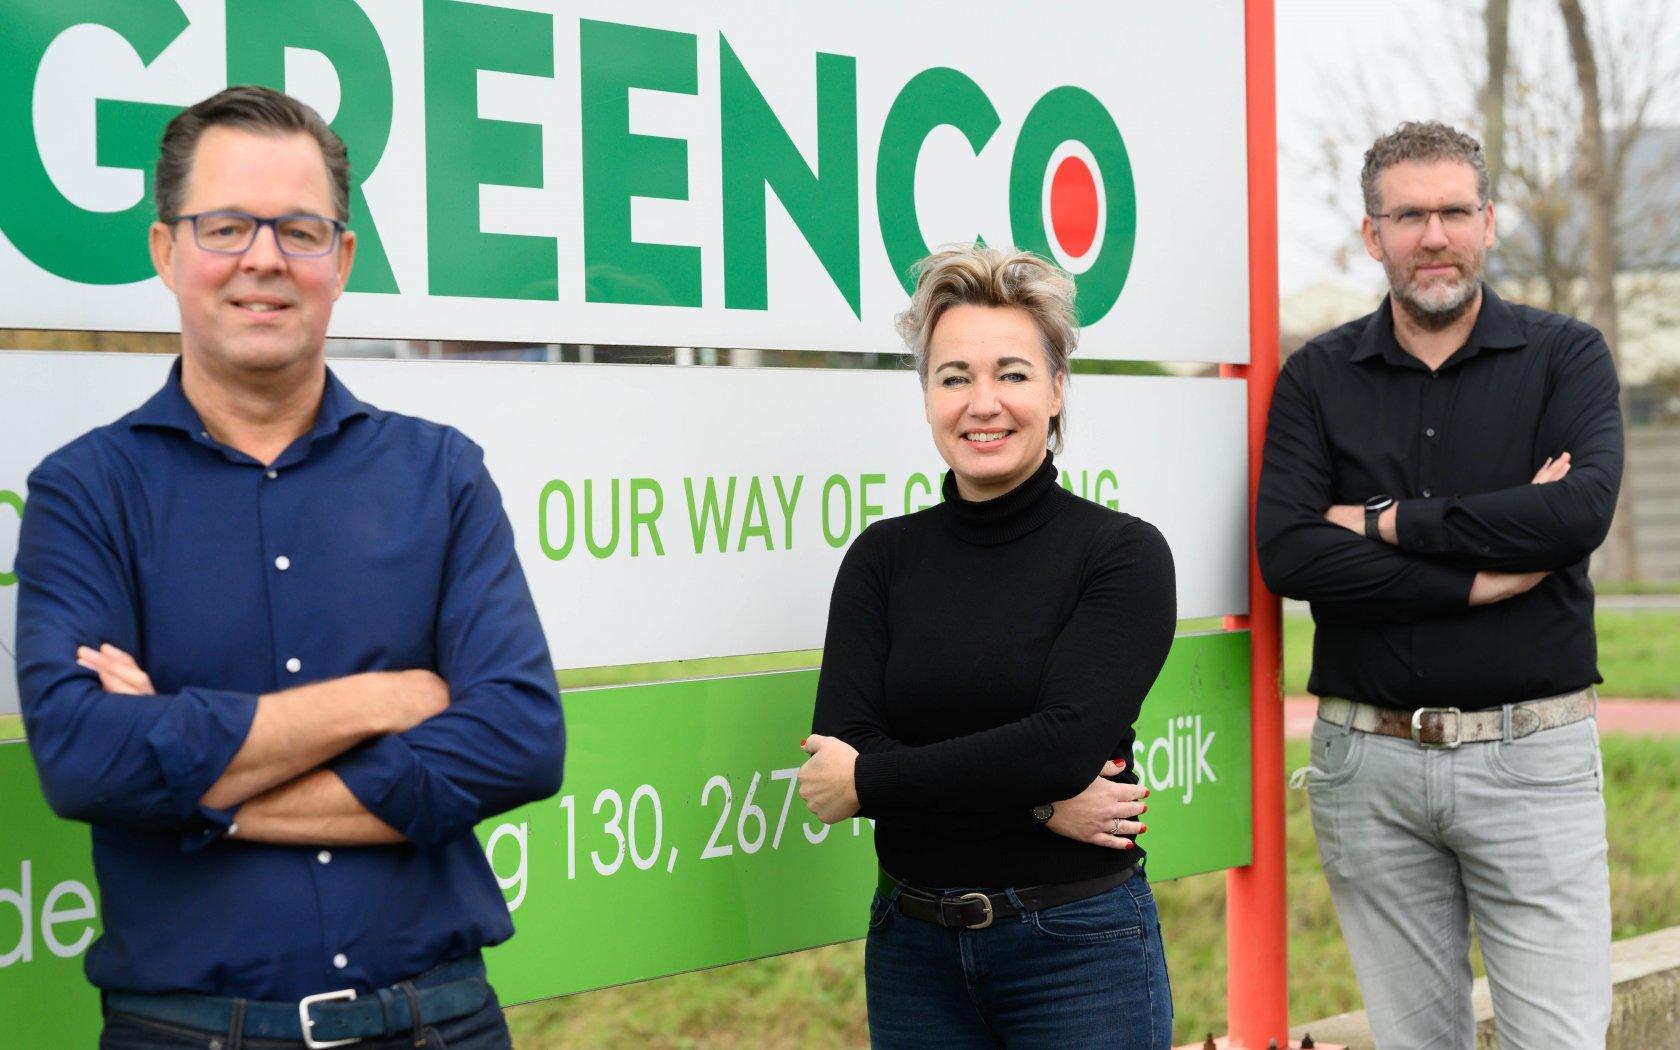 Greenco en The Greenery: Samen nieuwe marktkansen creëren